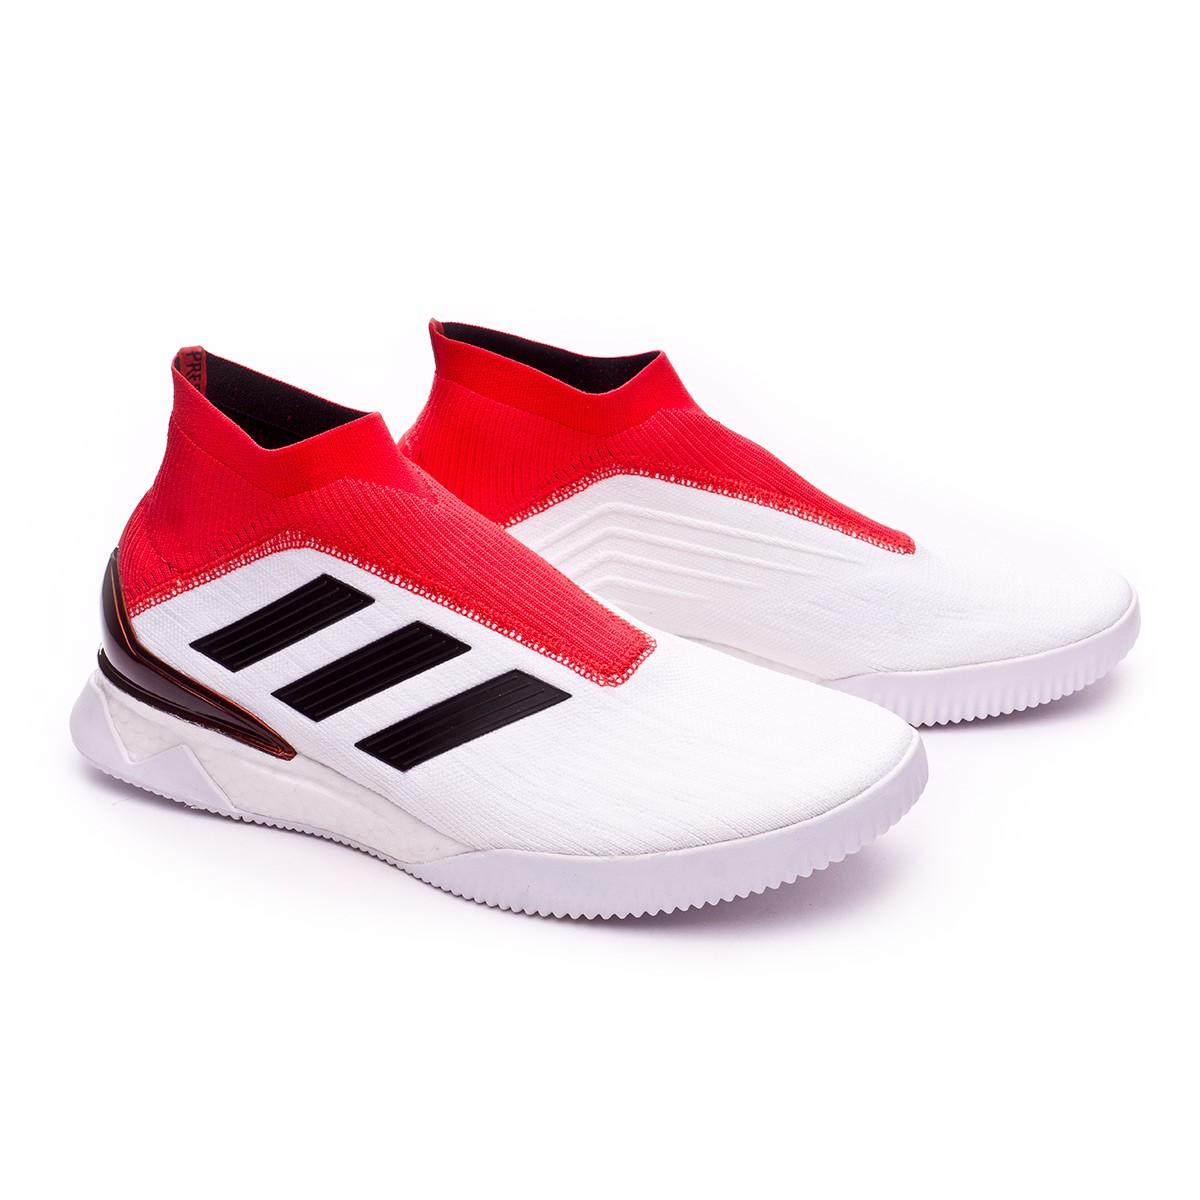 Trainers adidas Predator Tango 18+ TR UltraBoost White-Core